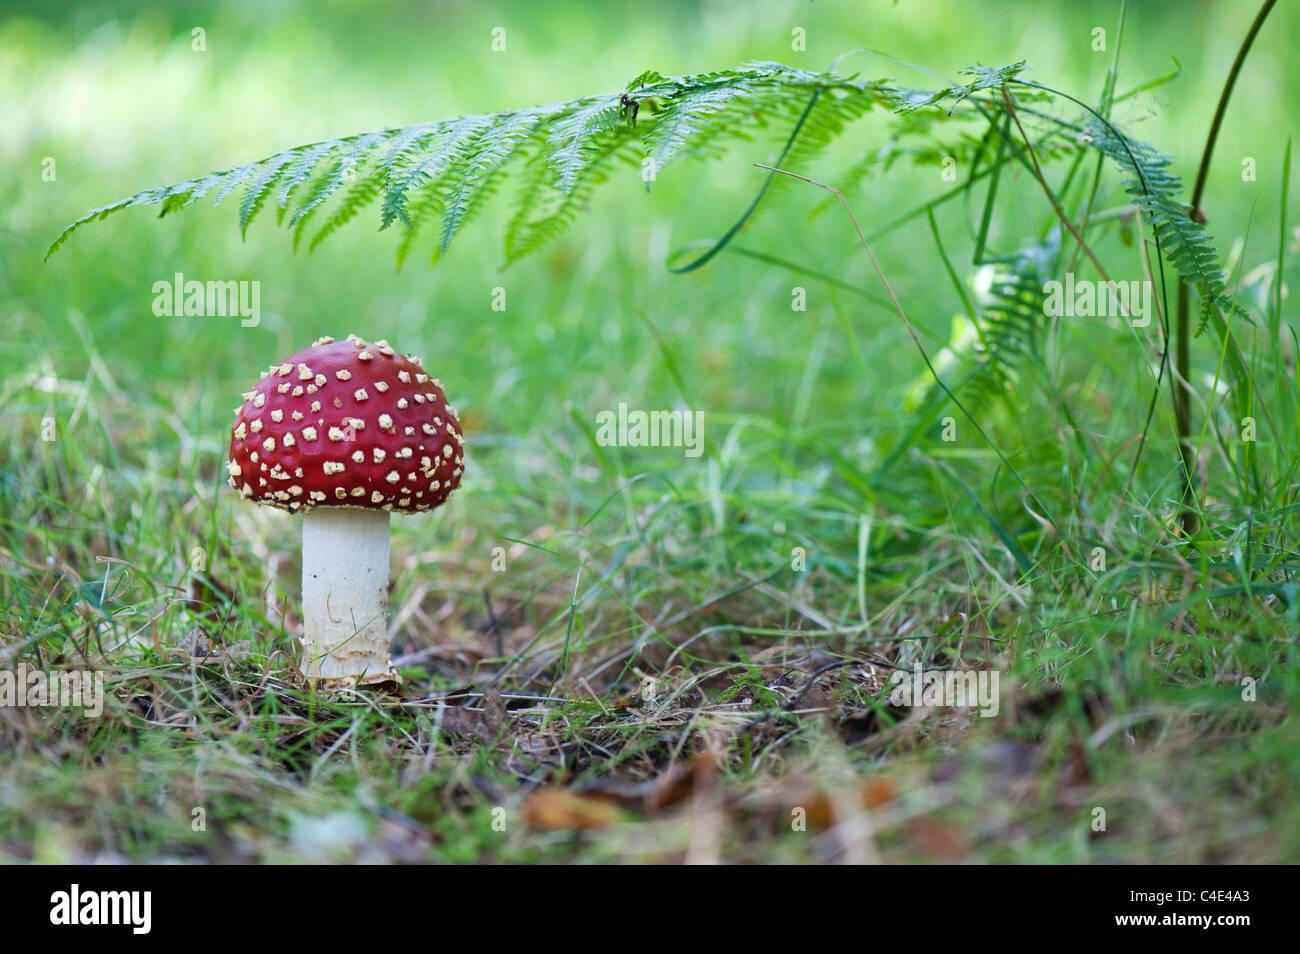 Amanita muscaria, Fly agaric mushroom growing in an english woodland. Stock Photo